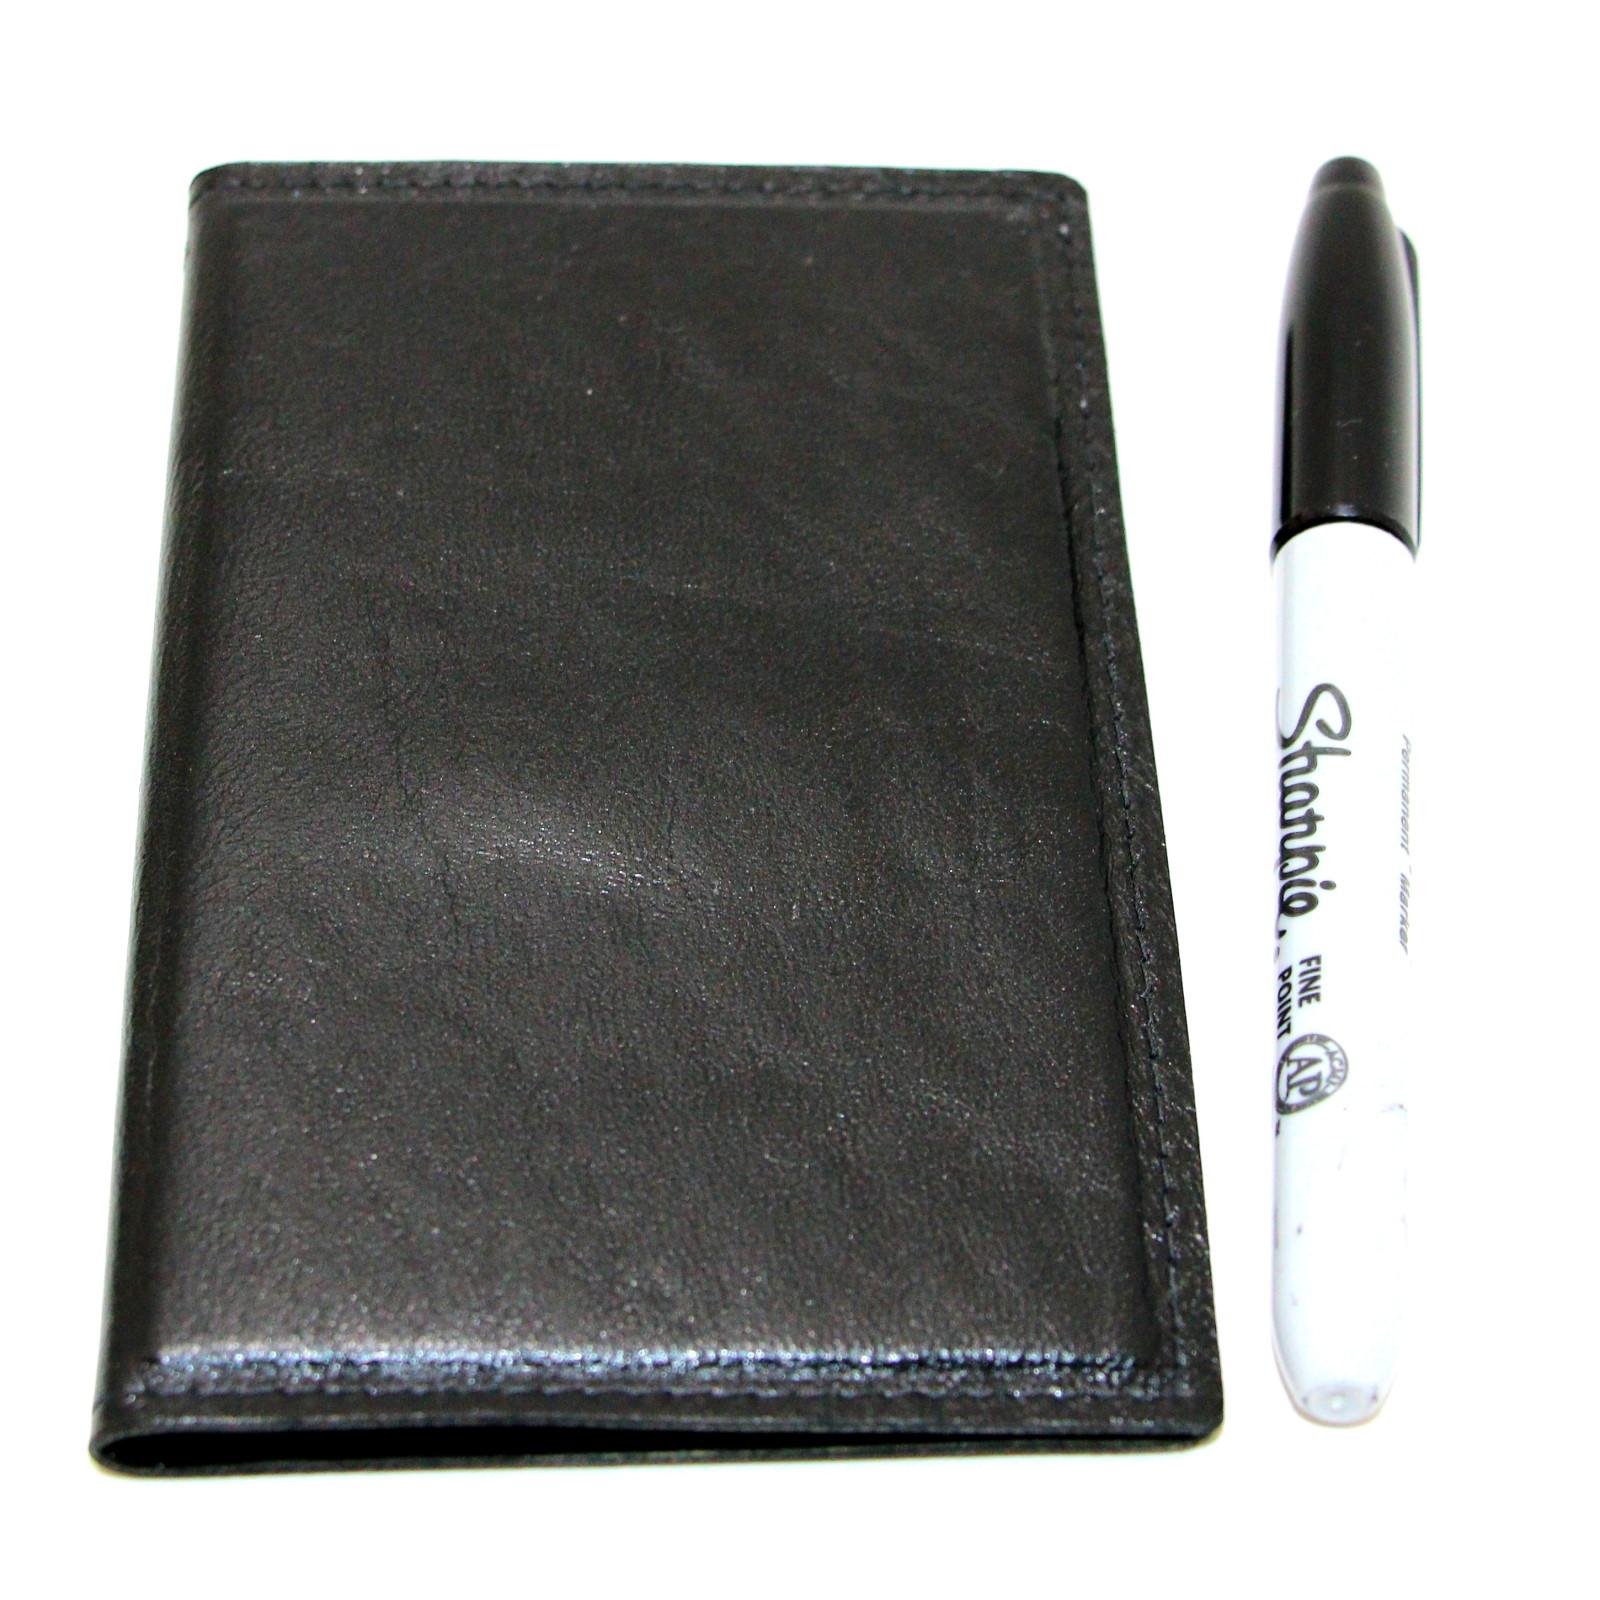 Gyp-Pad Wallet by Ray Piatt